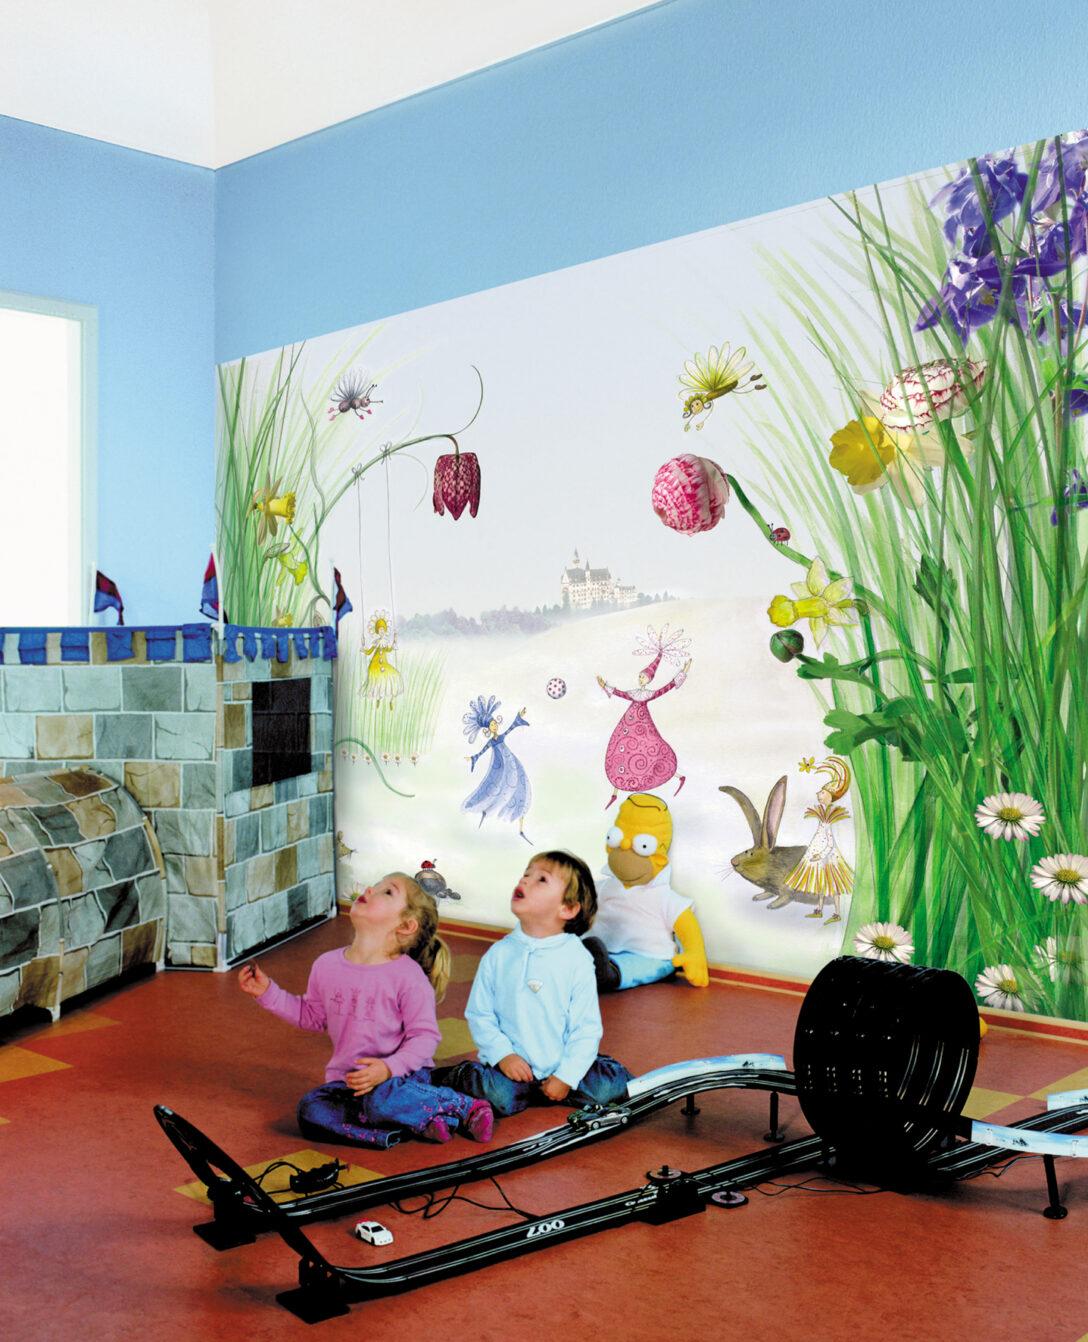 Large Size of Fototapeten Kinderzimmer Kiss Regale Sofa Regal Weiß Wohnzimmer Kinderzimmer Fototapeten Kinderzimmer